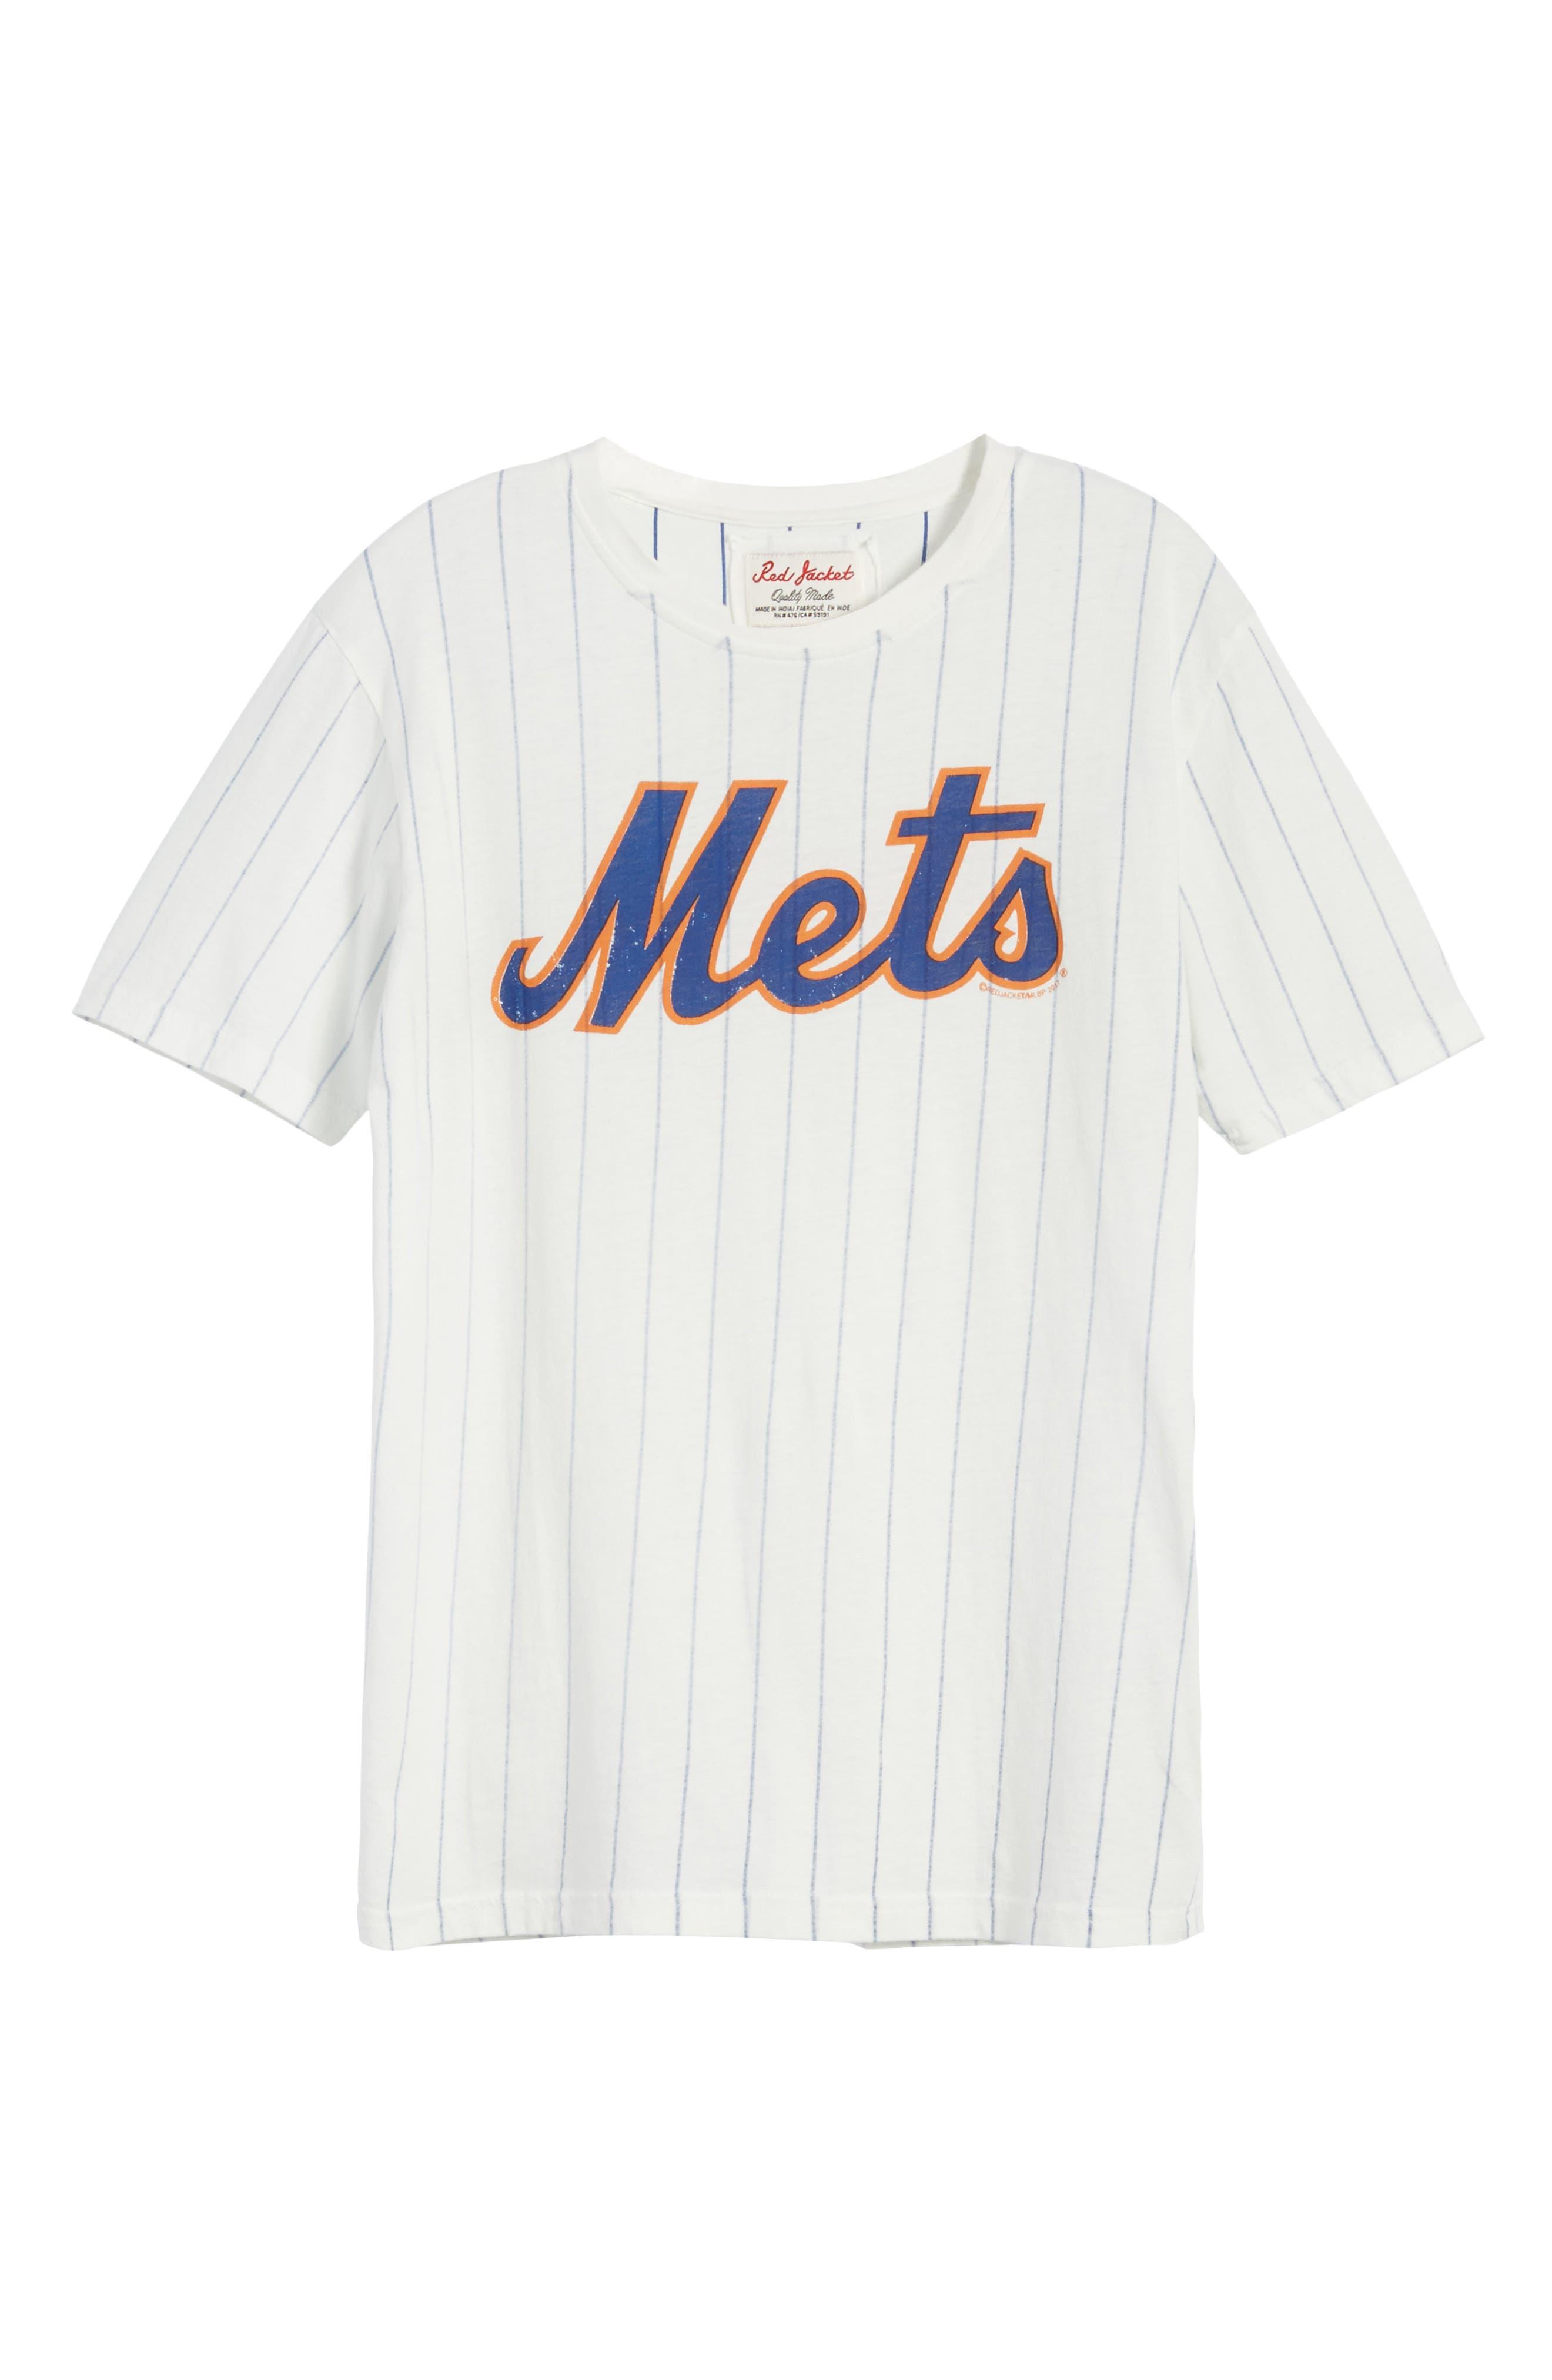 Brass Tack New York Mets T-Shirt,                             Alternate thumbnail 6, color,                             182